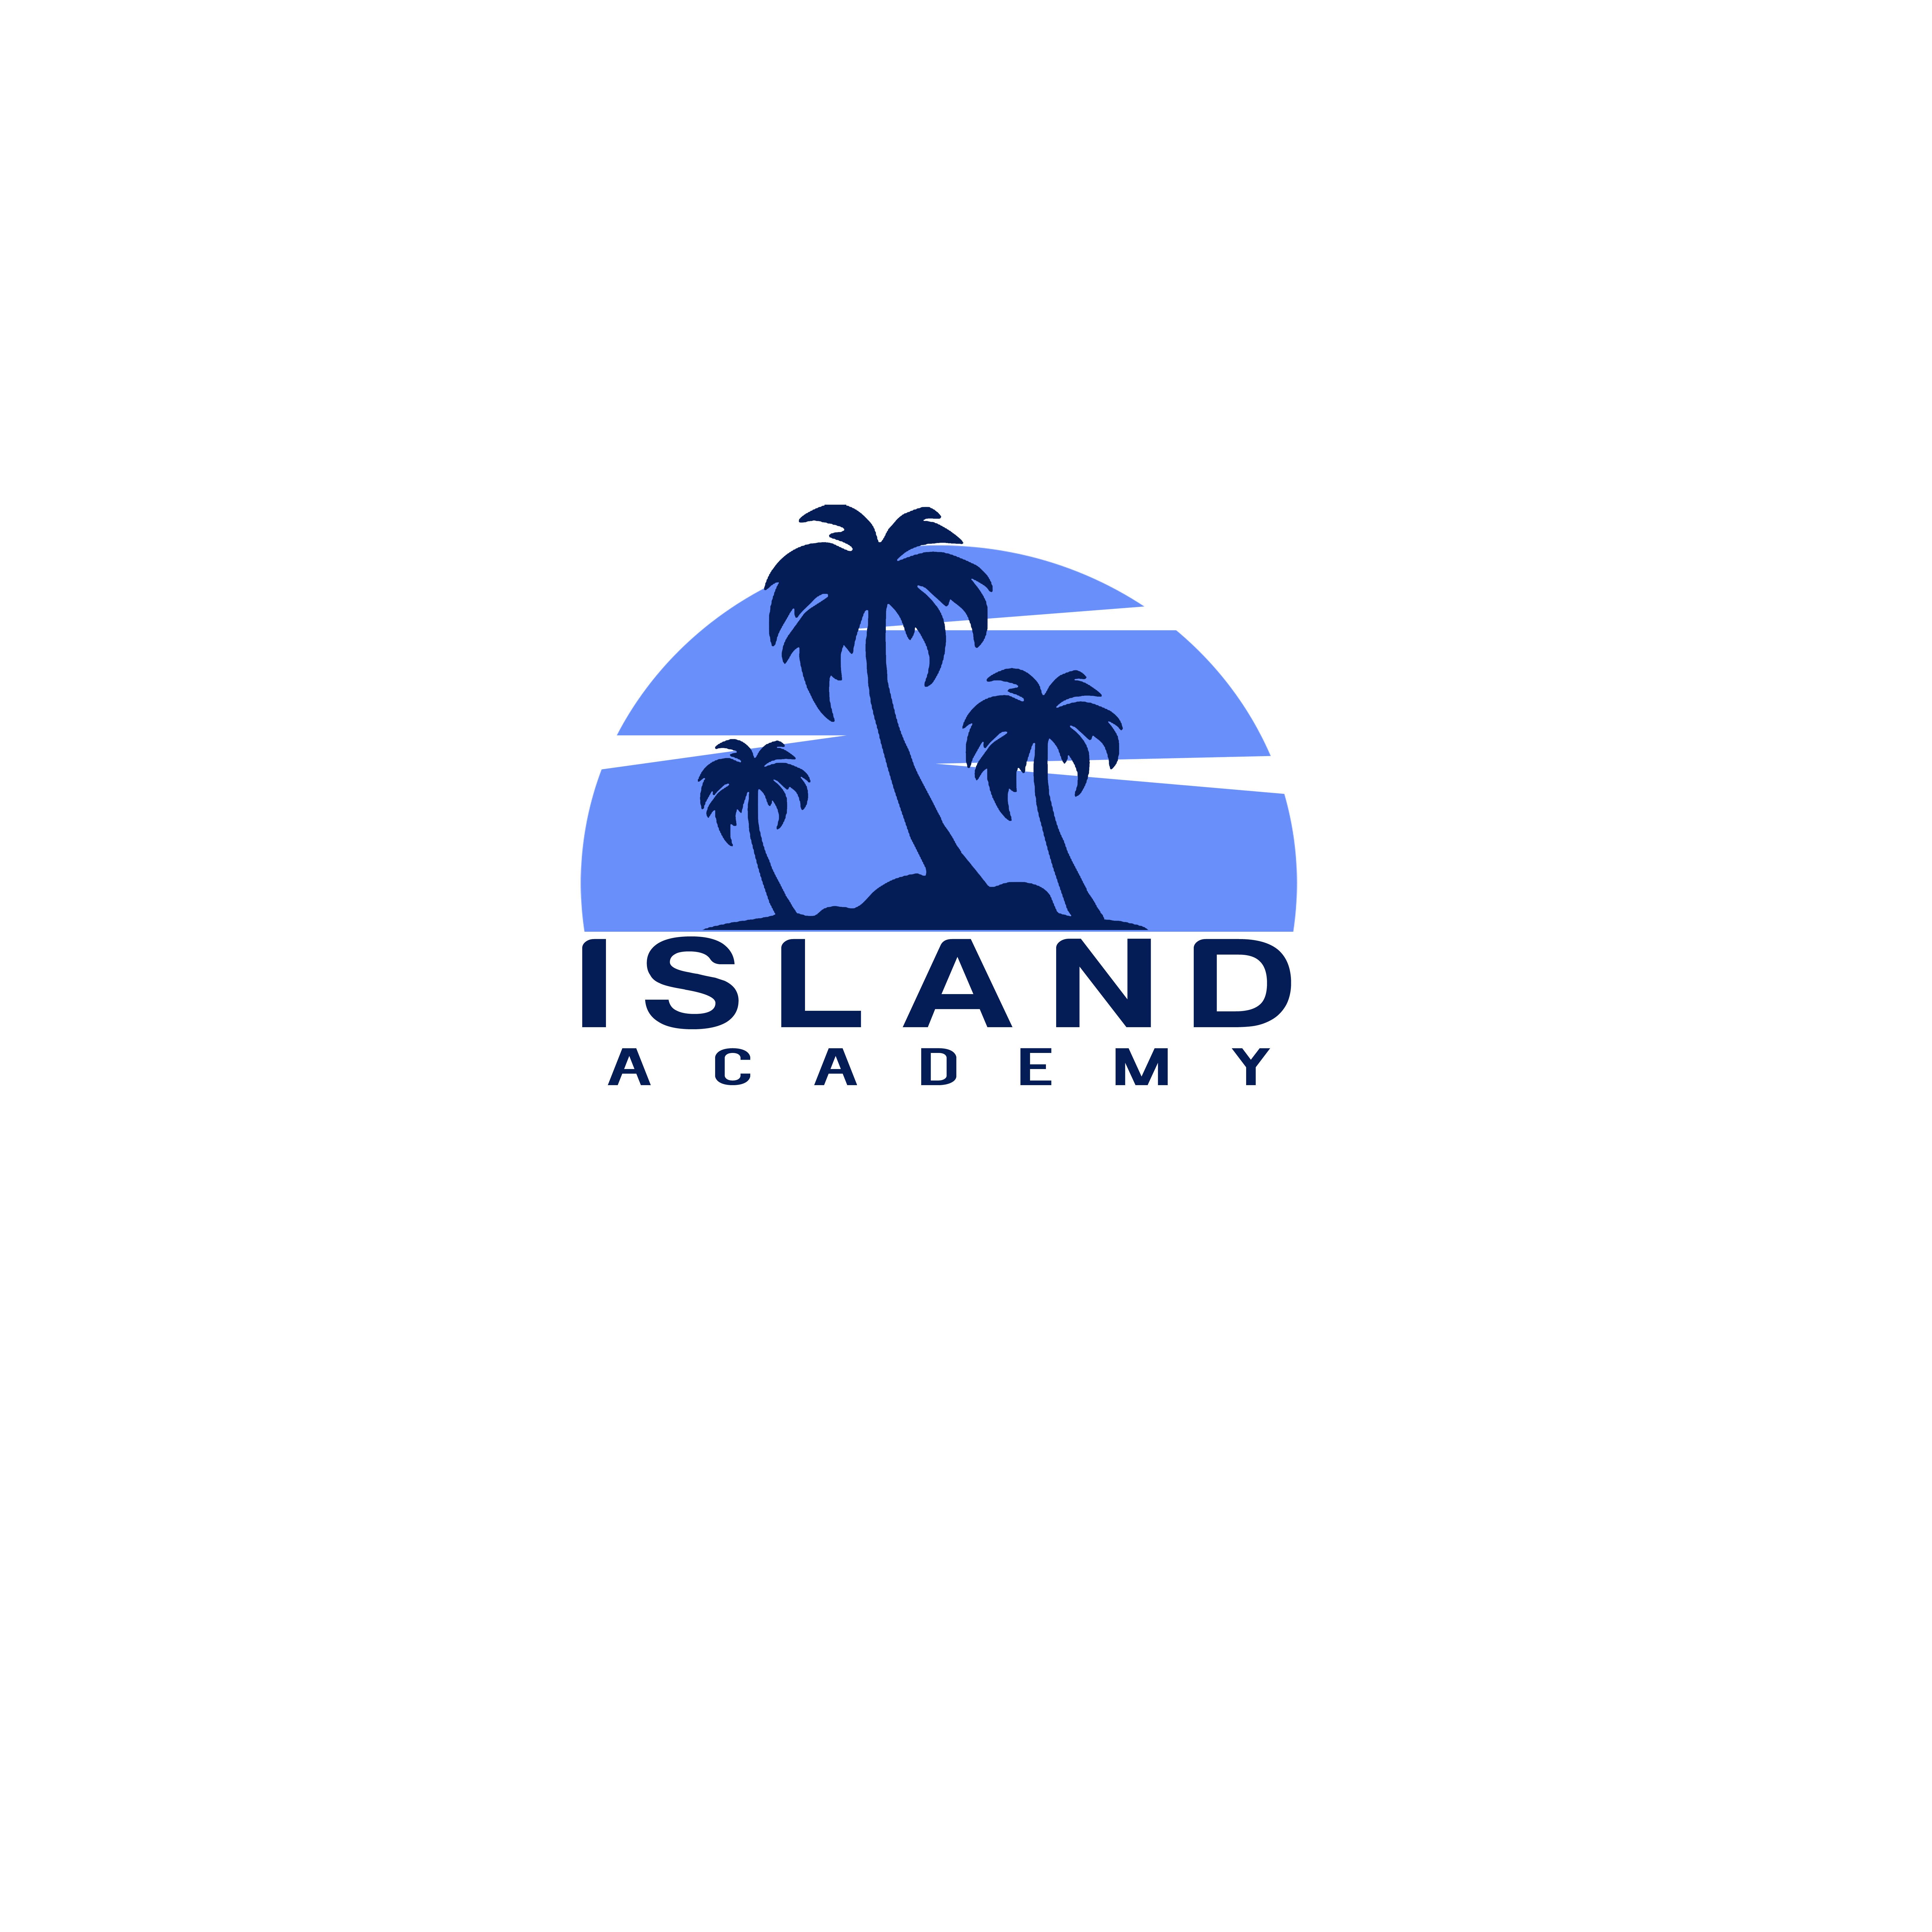 Logo Design by Allan Esclamado - Entry No. 3 in the Logo Design Contest New Logo Design for Island Academy.